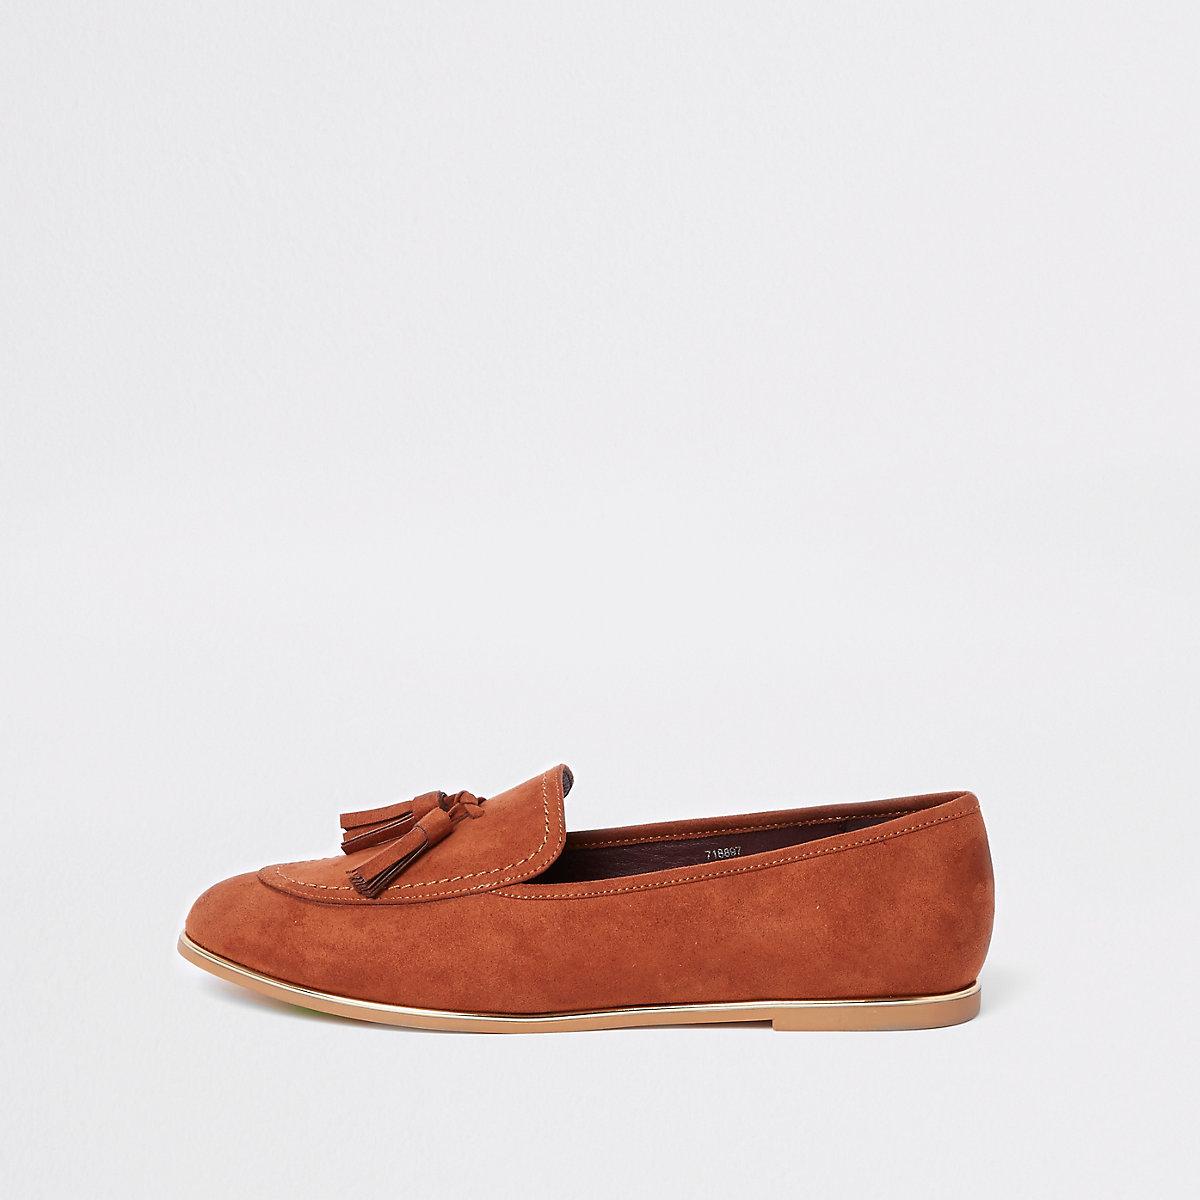 Beige gold tone trim tassel loafers